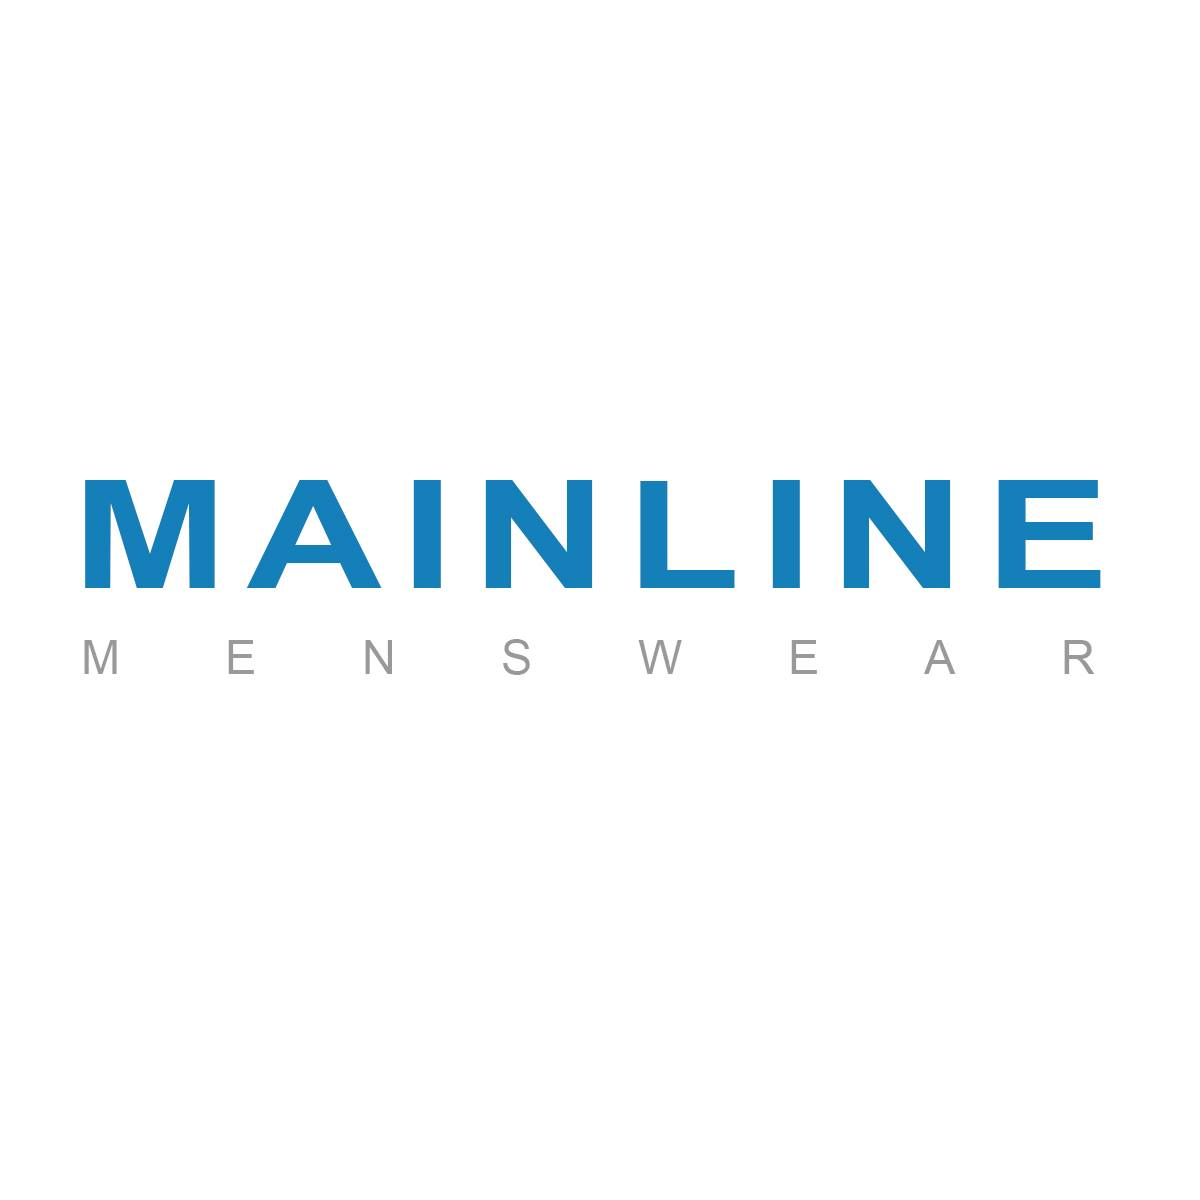 mainline-menswear-au-logo